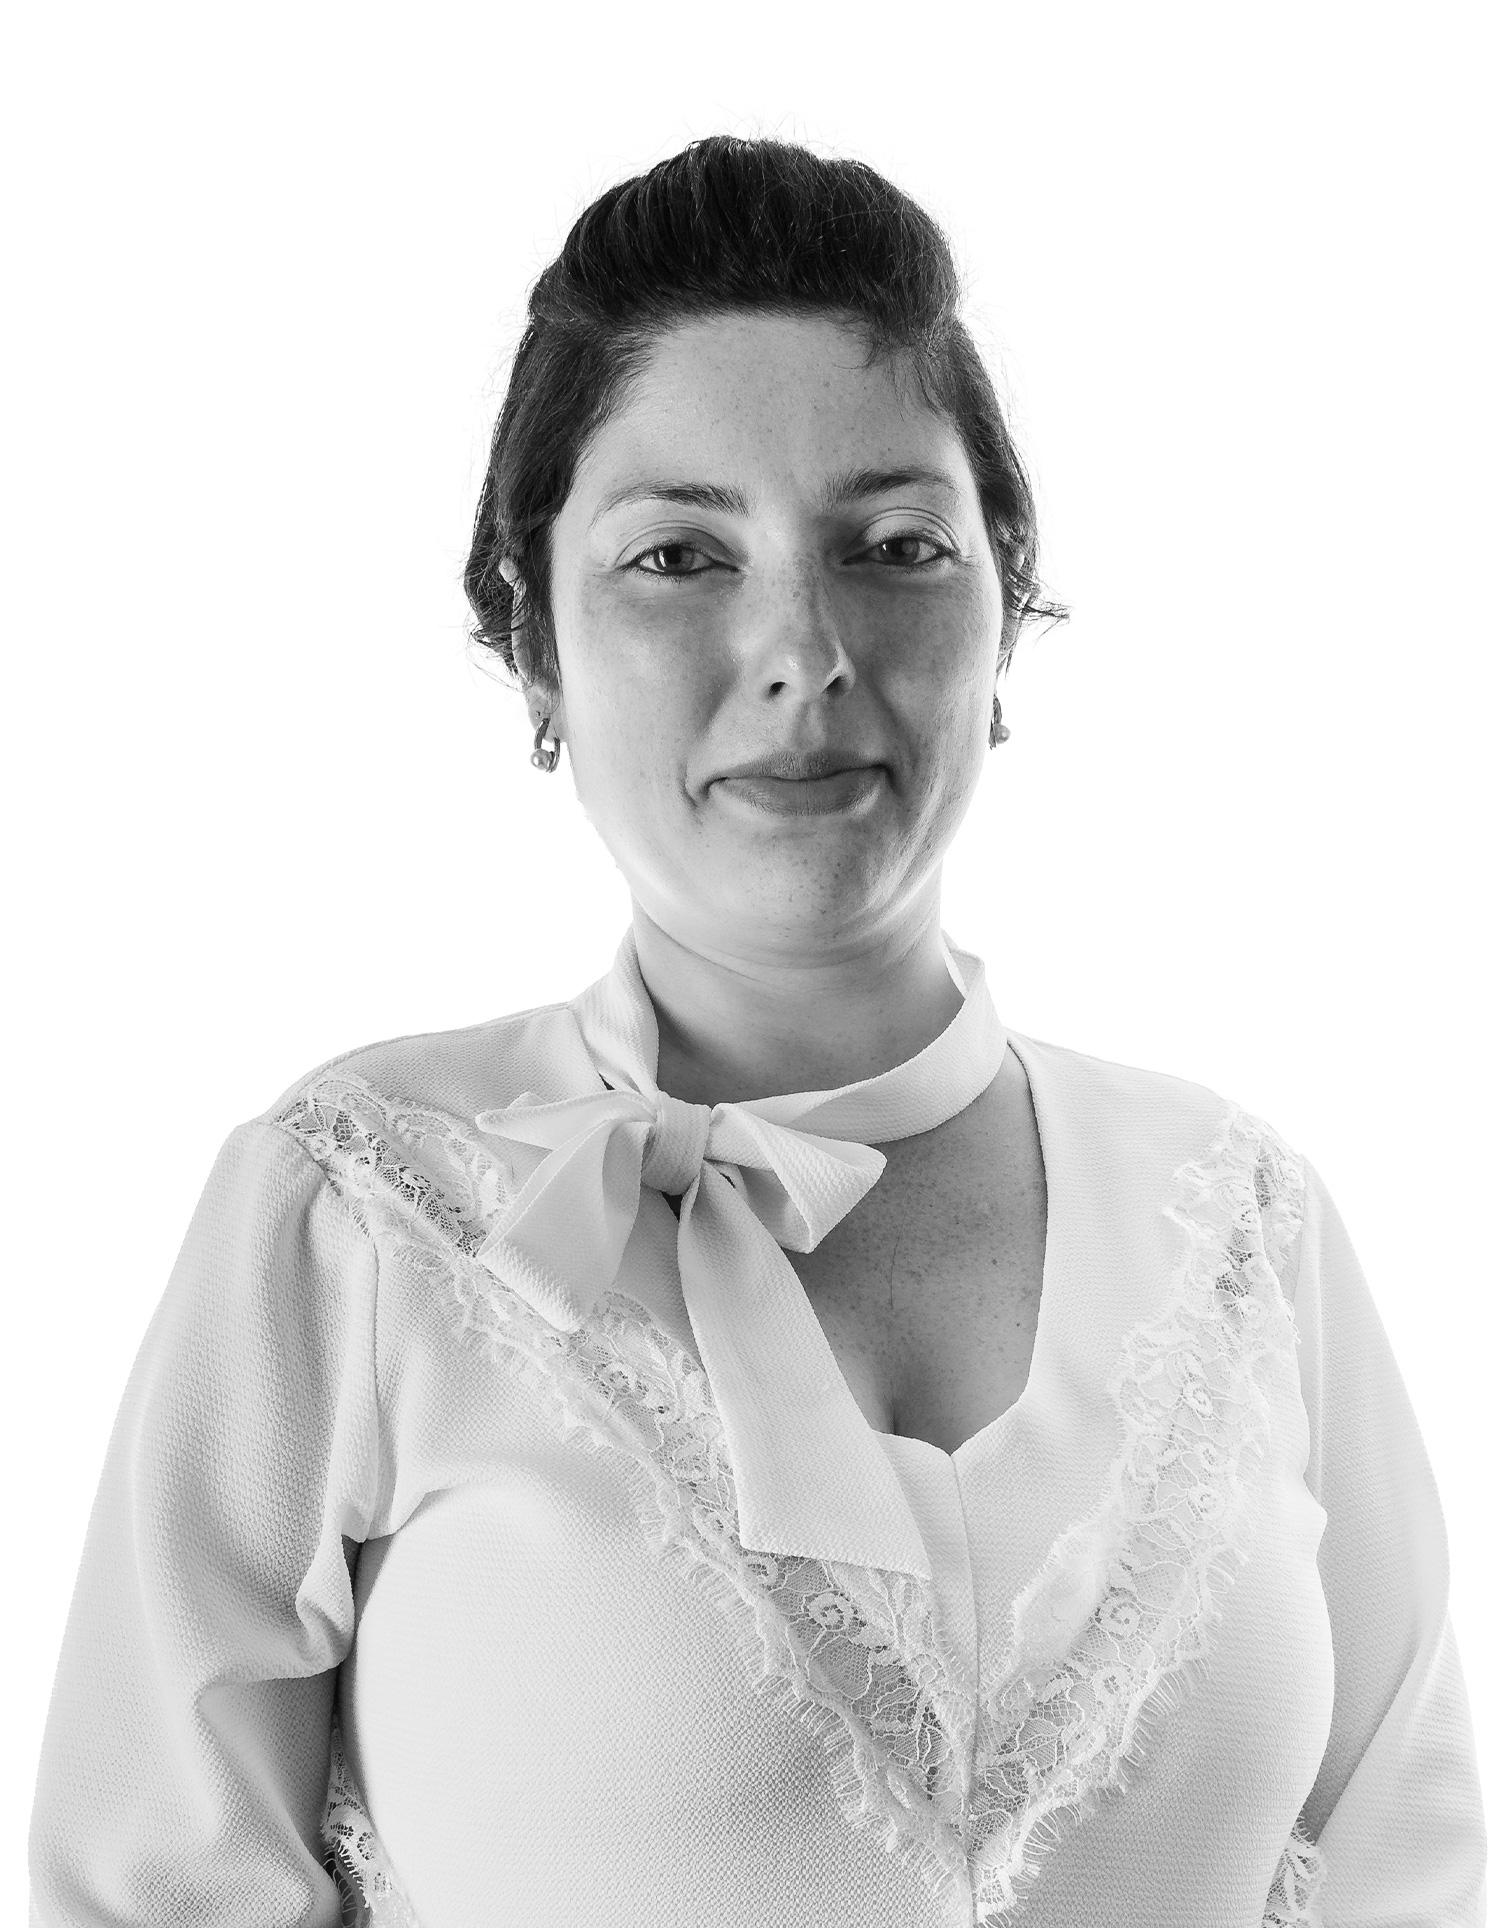 Luisa Scafuro Silva